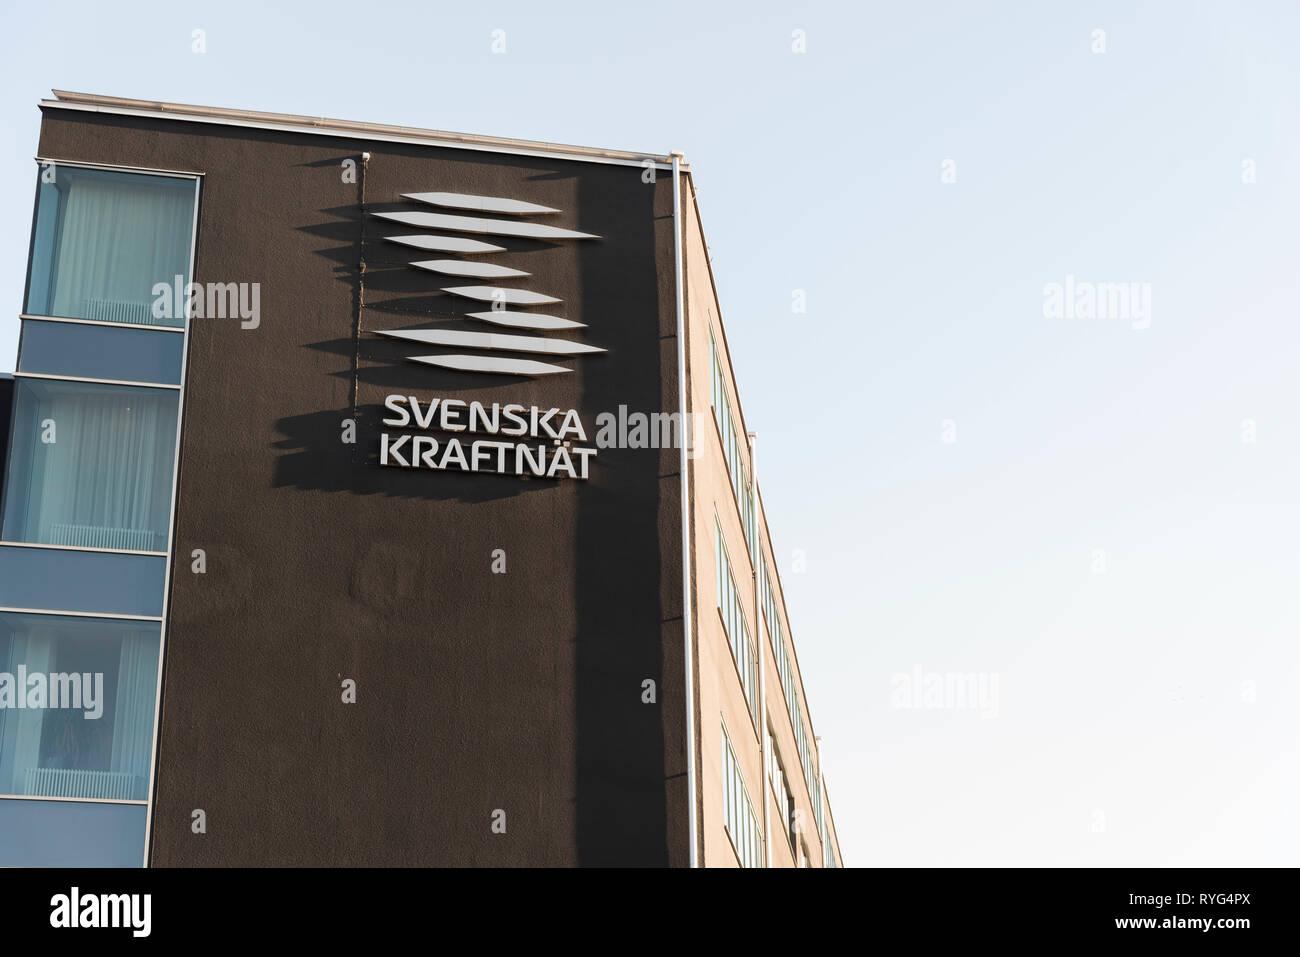 Headquarters of Svenska Kraftnät in Sundbyberg. Stockholm, Sweden. - Stock Image